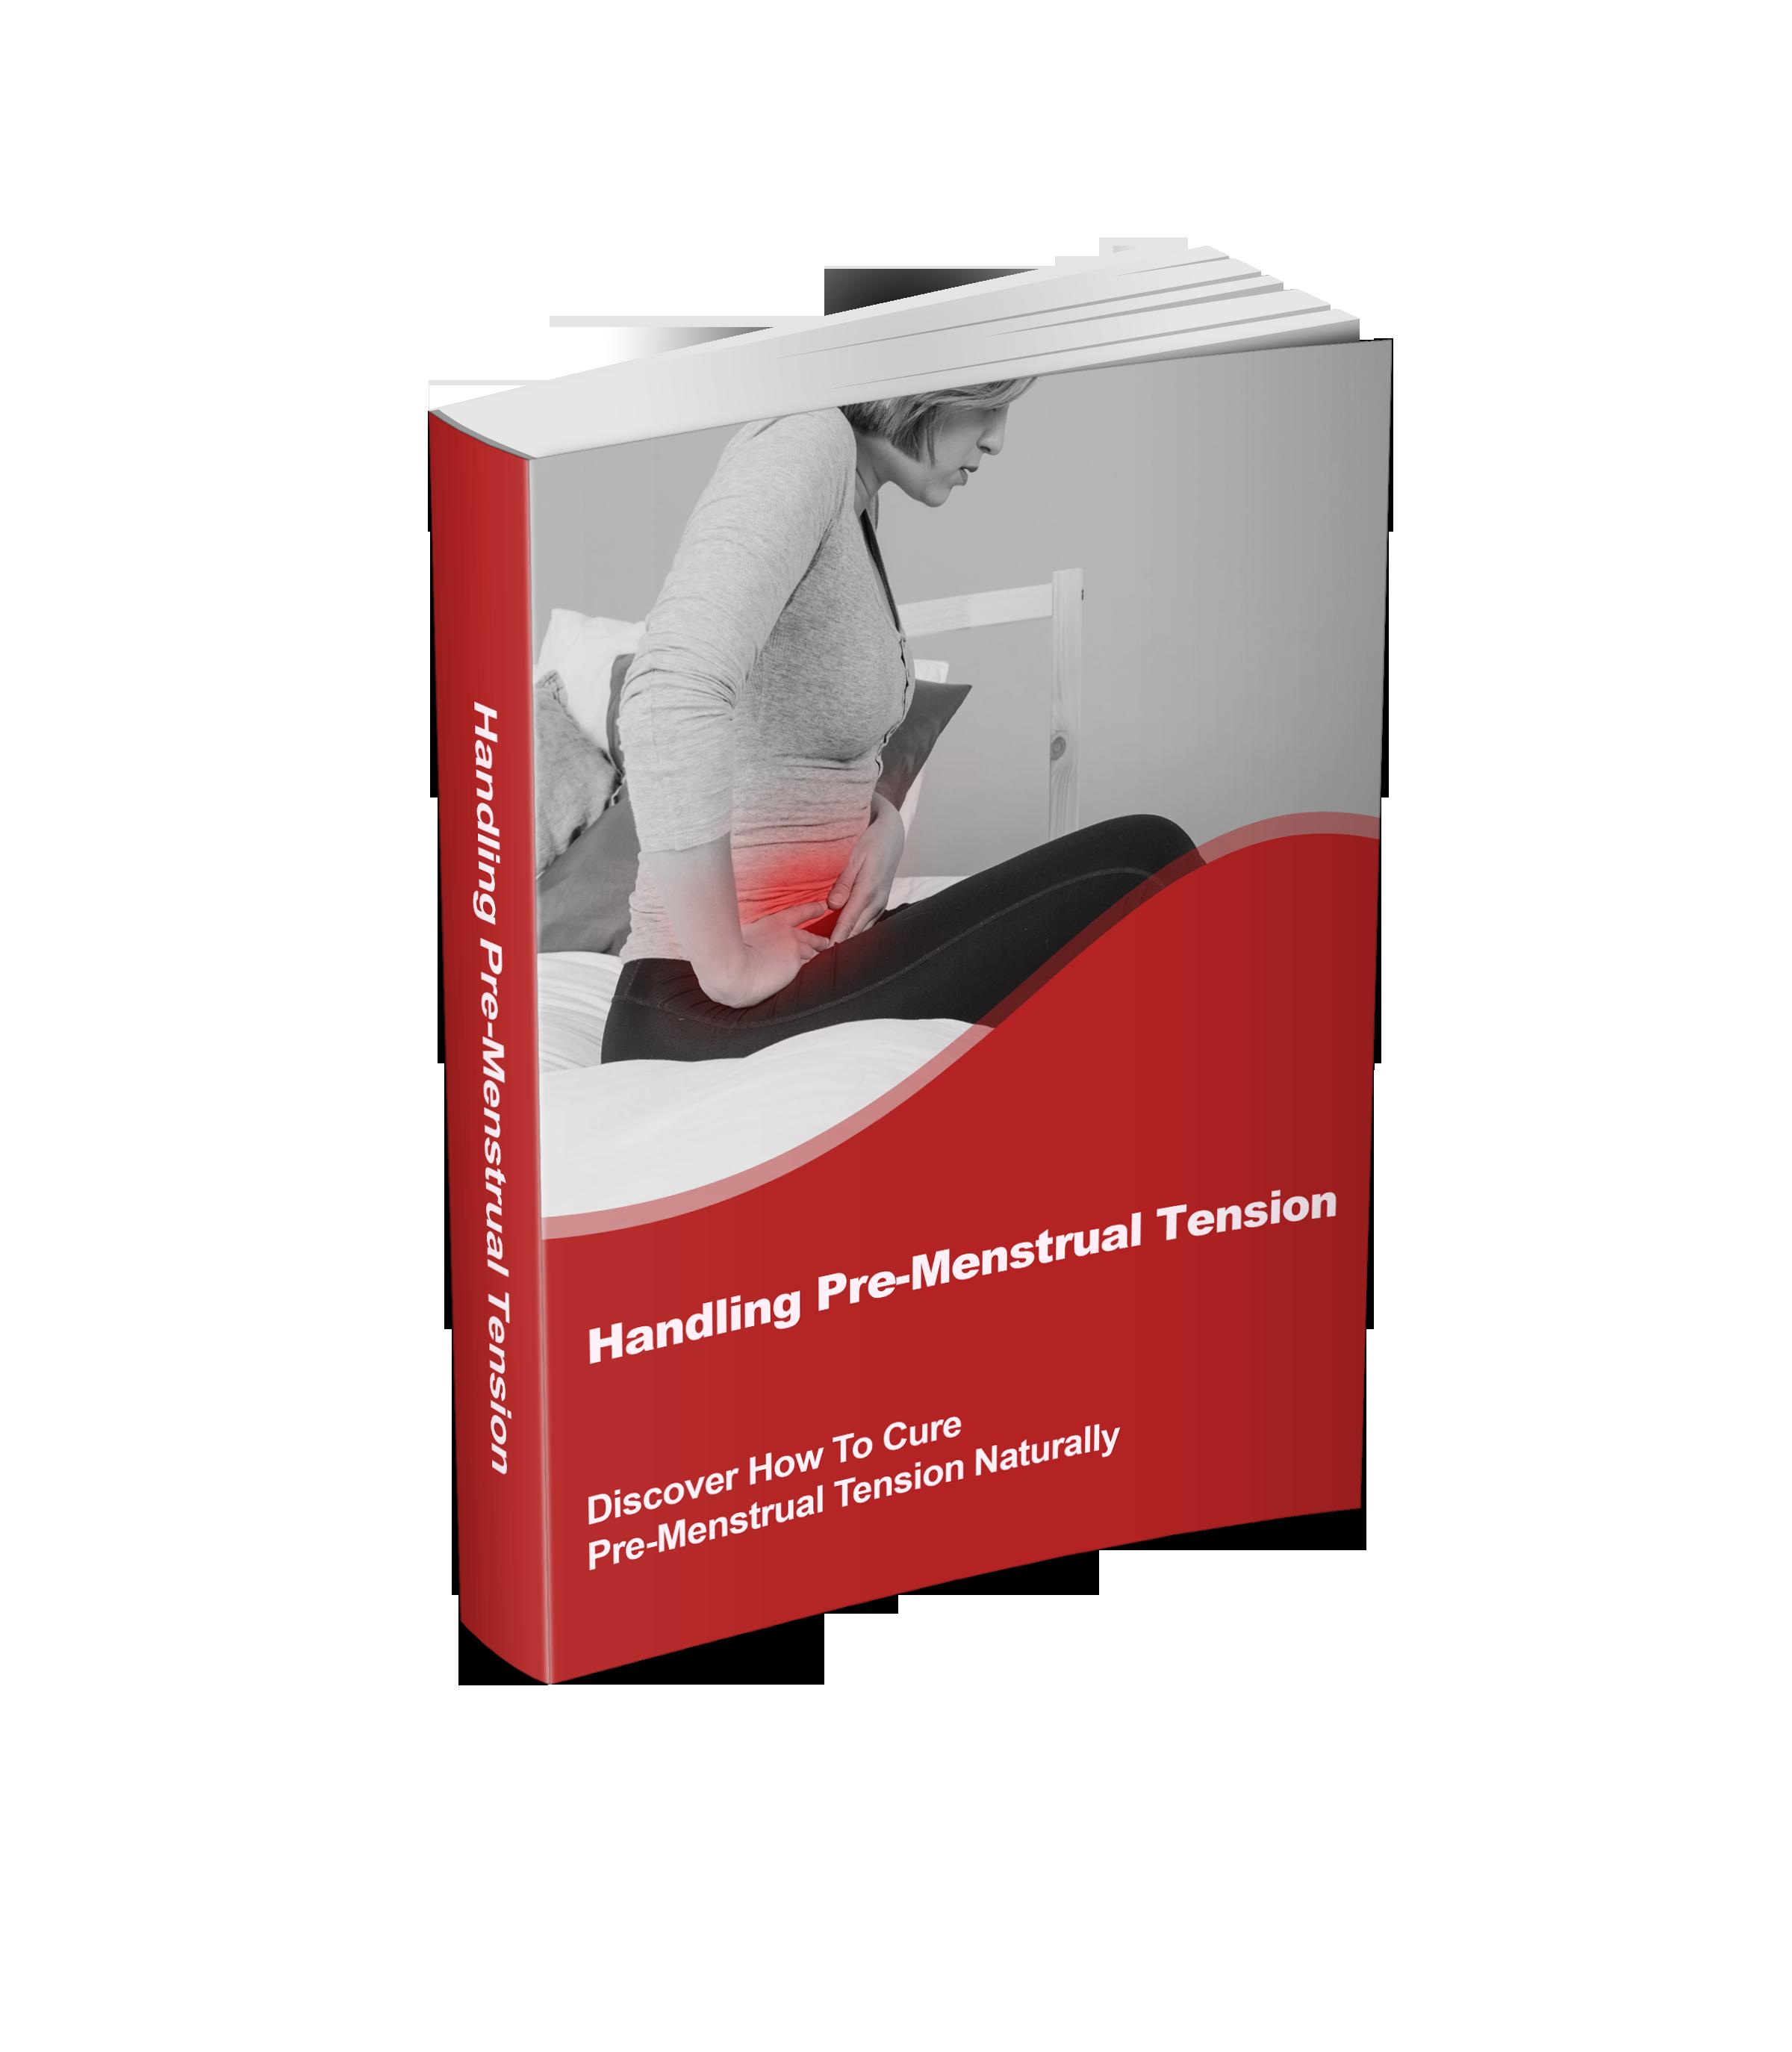 Handling-Pre-menstrual-Tension.png